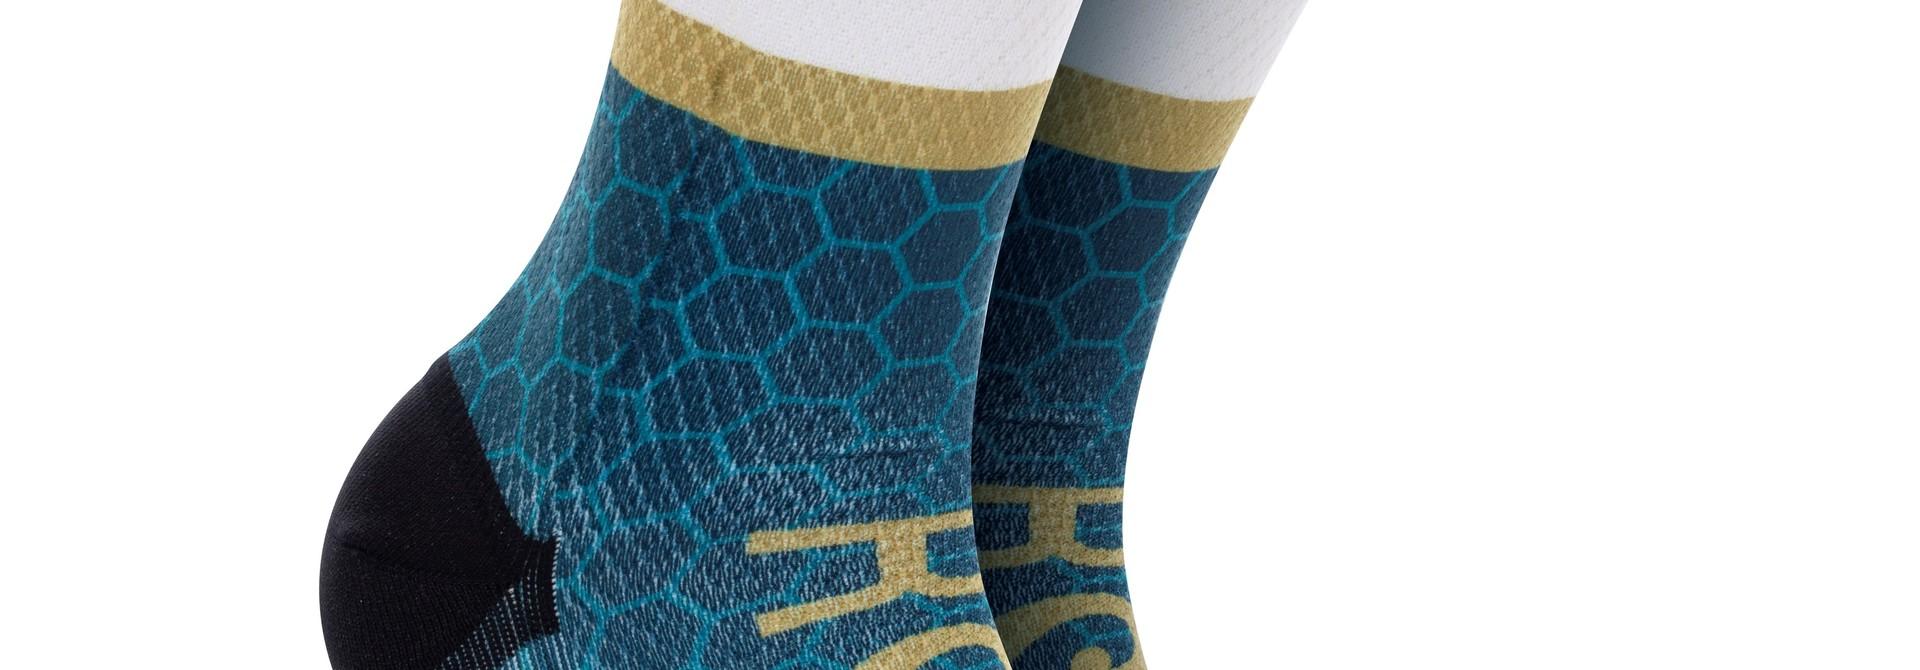 Performance Socks Champion Design